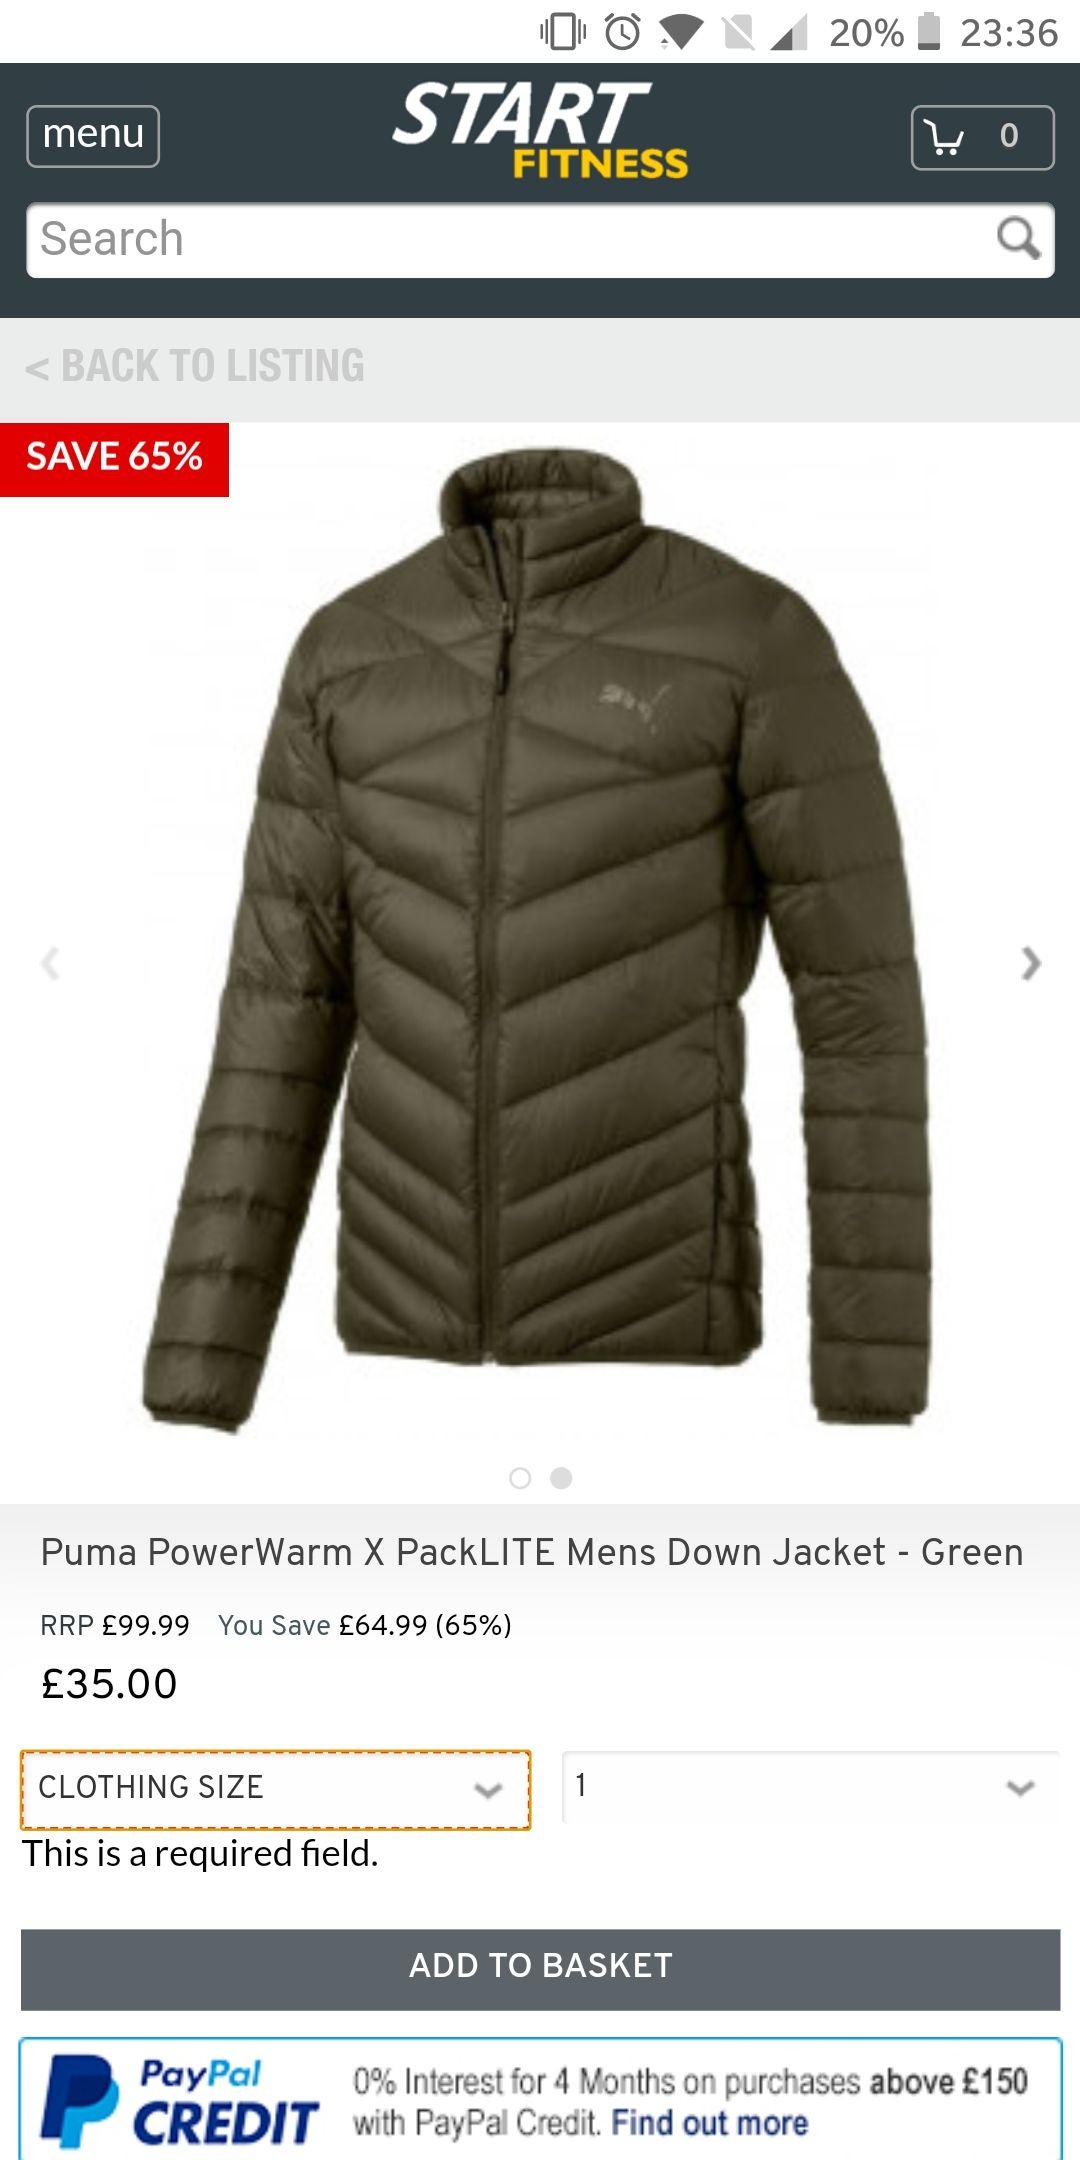 Puma PowerWarm X PackLITE Mens Down Jacket £35 + £4.95 delivery @ Start Fitness